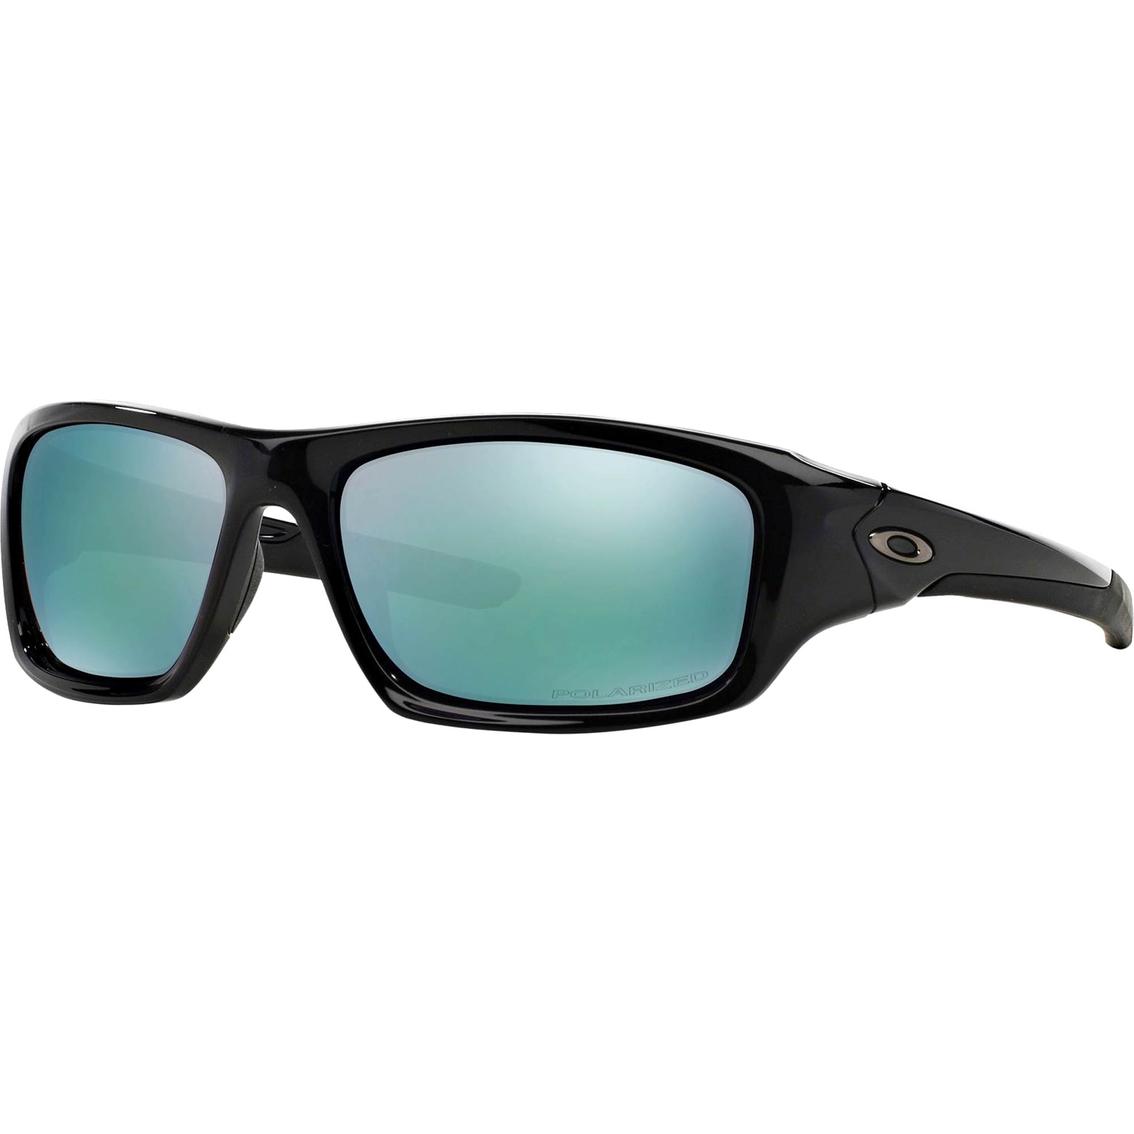 d0edce80c6 Oakley Valve Polarized Sunglasses Oo9236-12